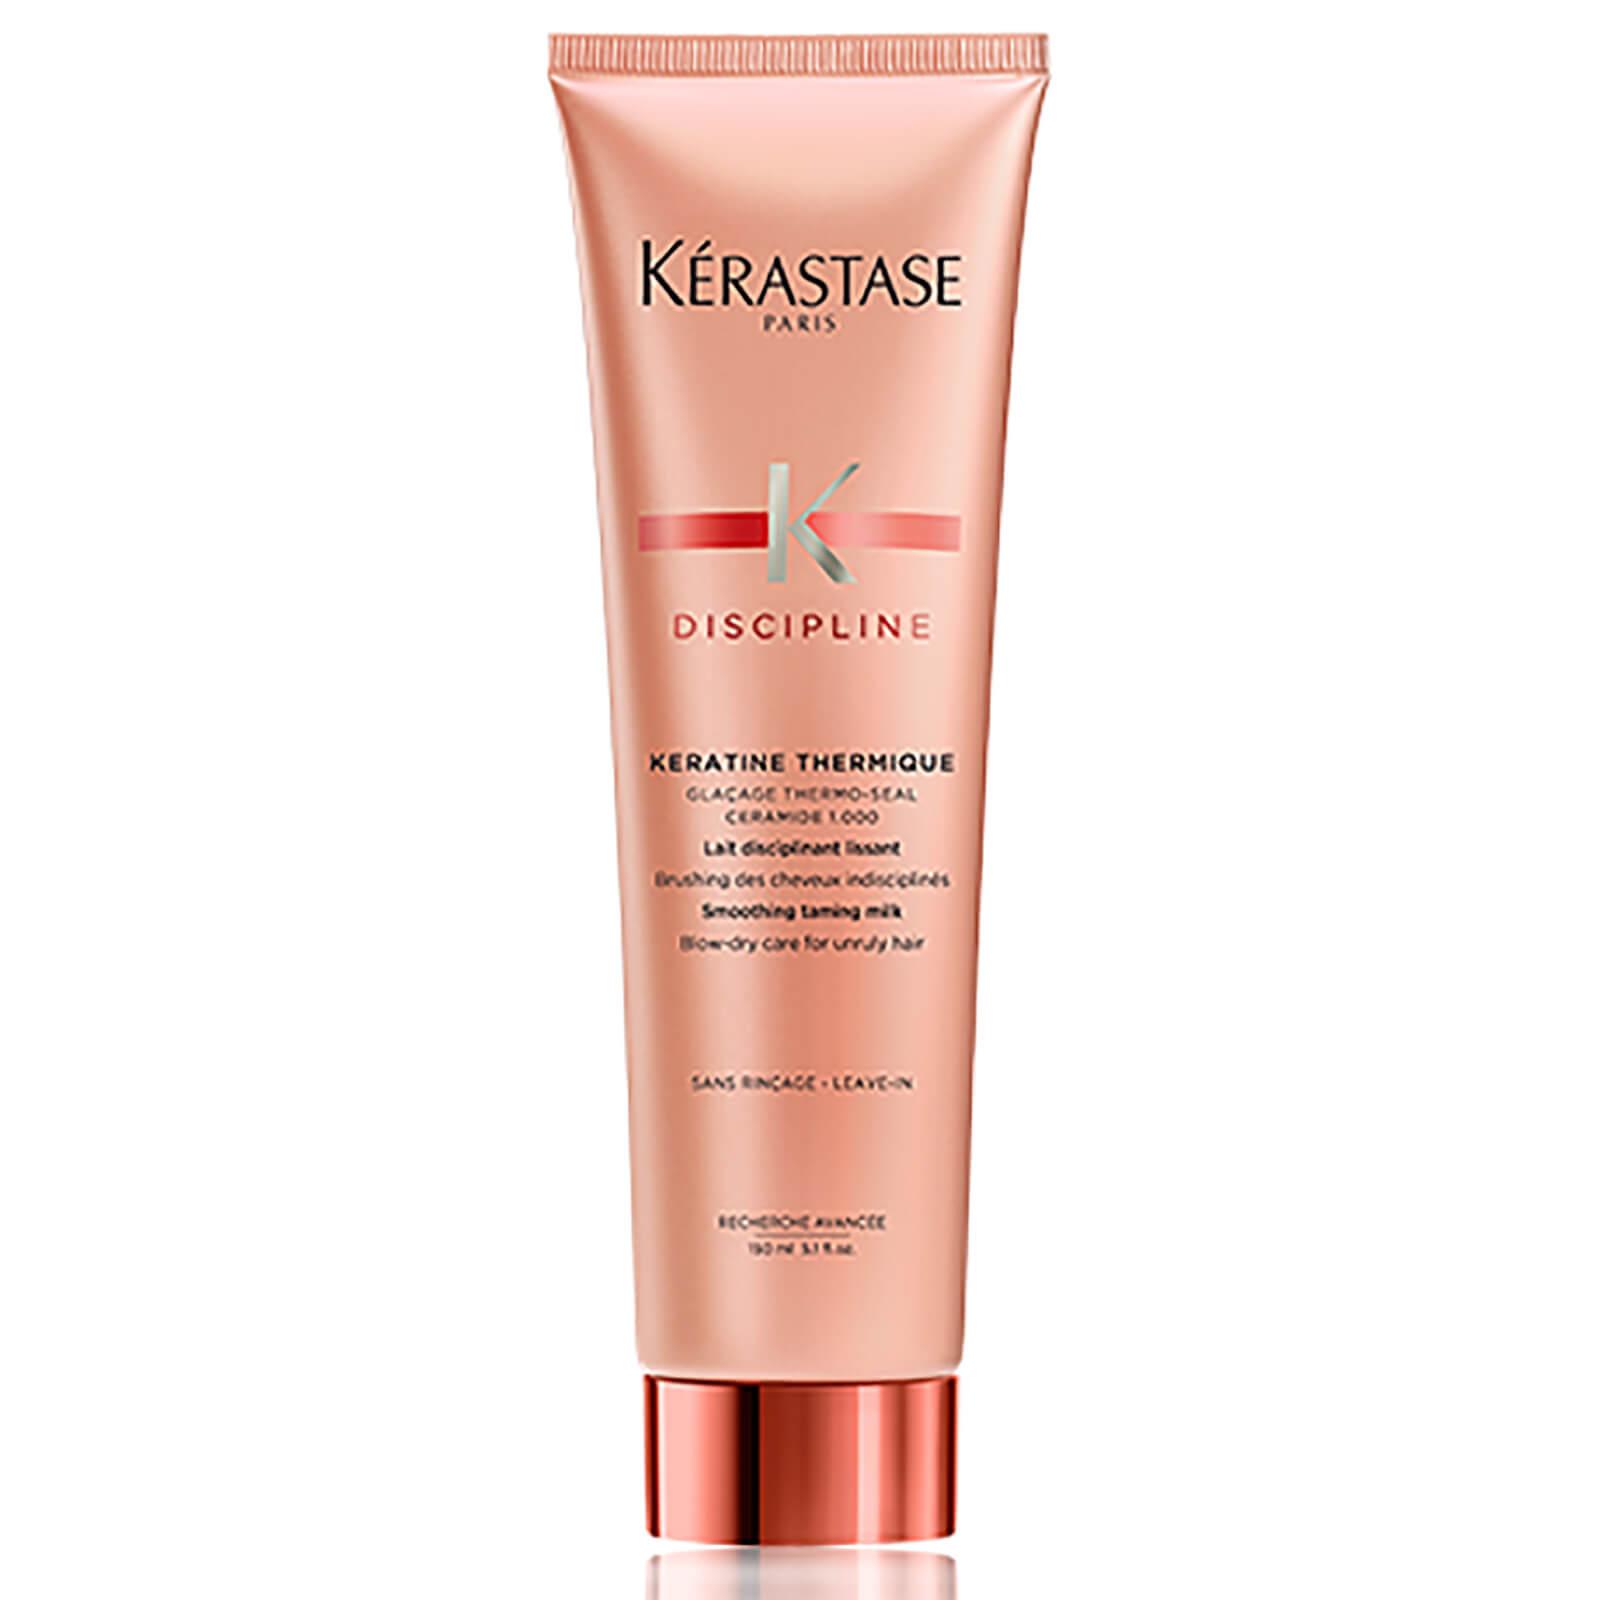 kerastase keratine thermique